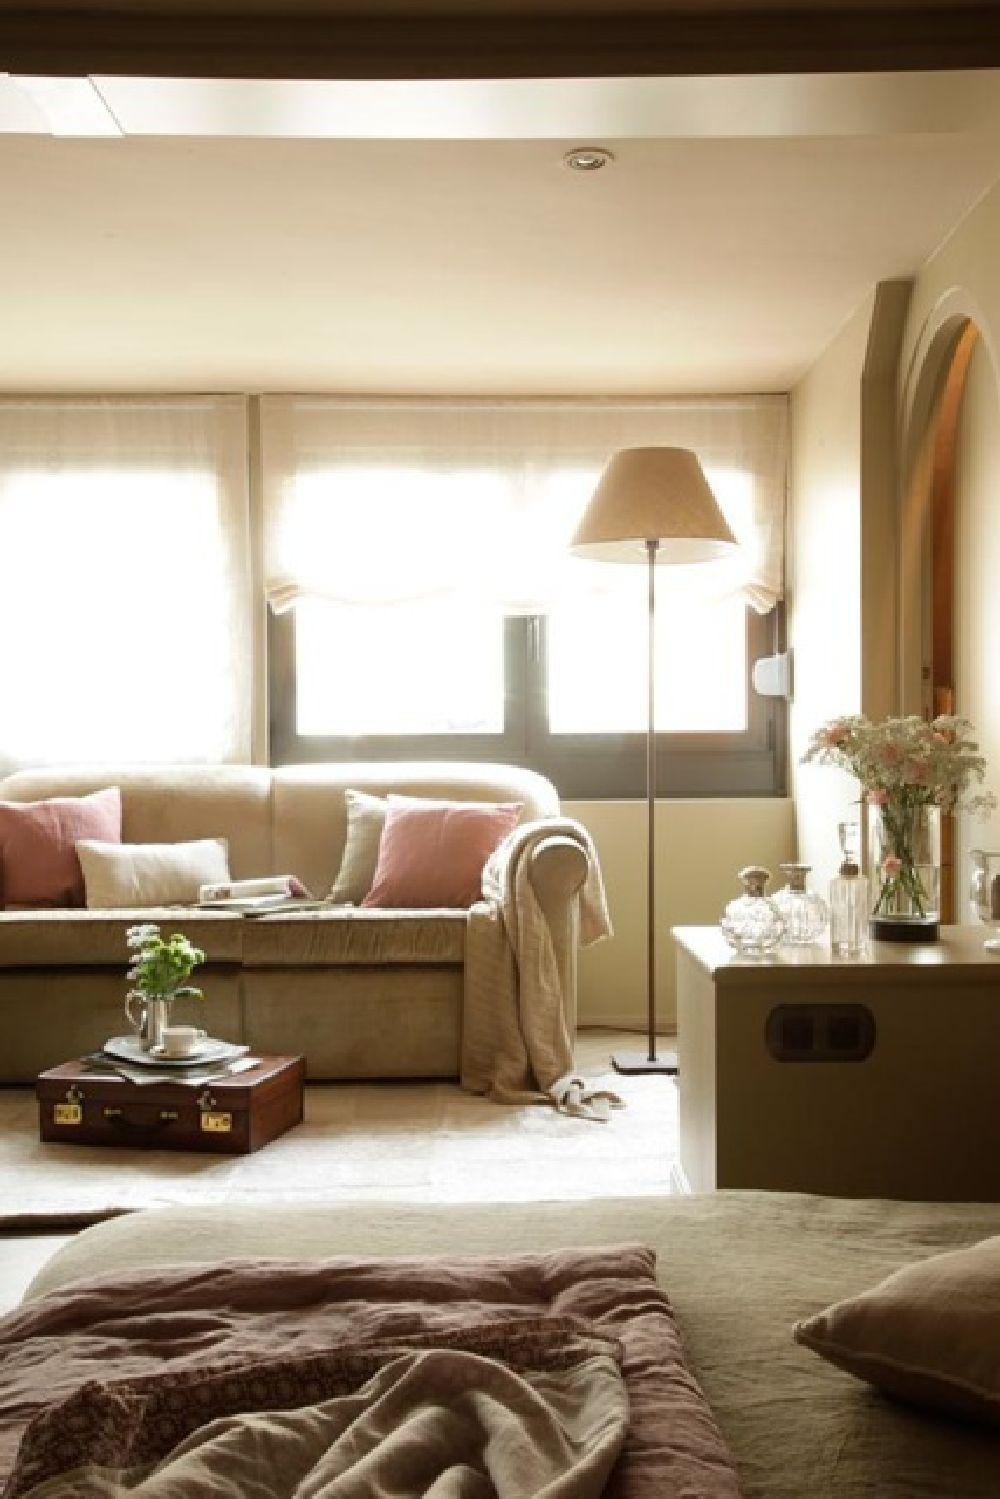 adelaparvu.com despre locuinta parter si mansarda in stil combinat clasic si rustic, designer Jeanette Tresing, Foto Jeanette Tresing (6)